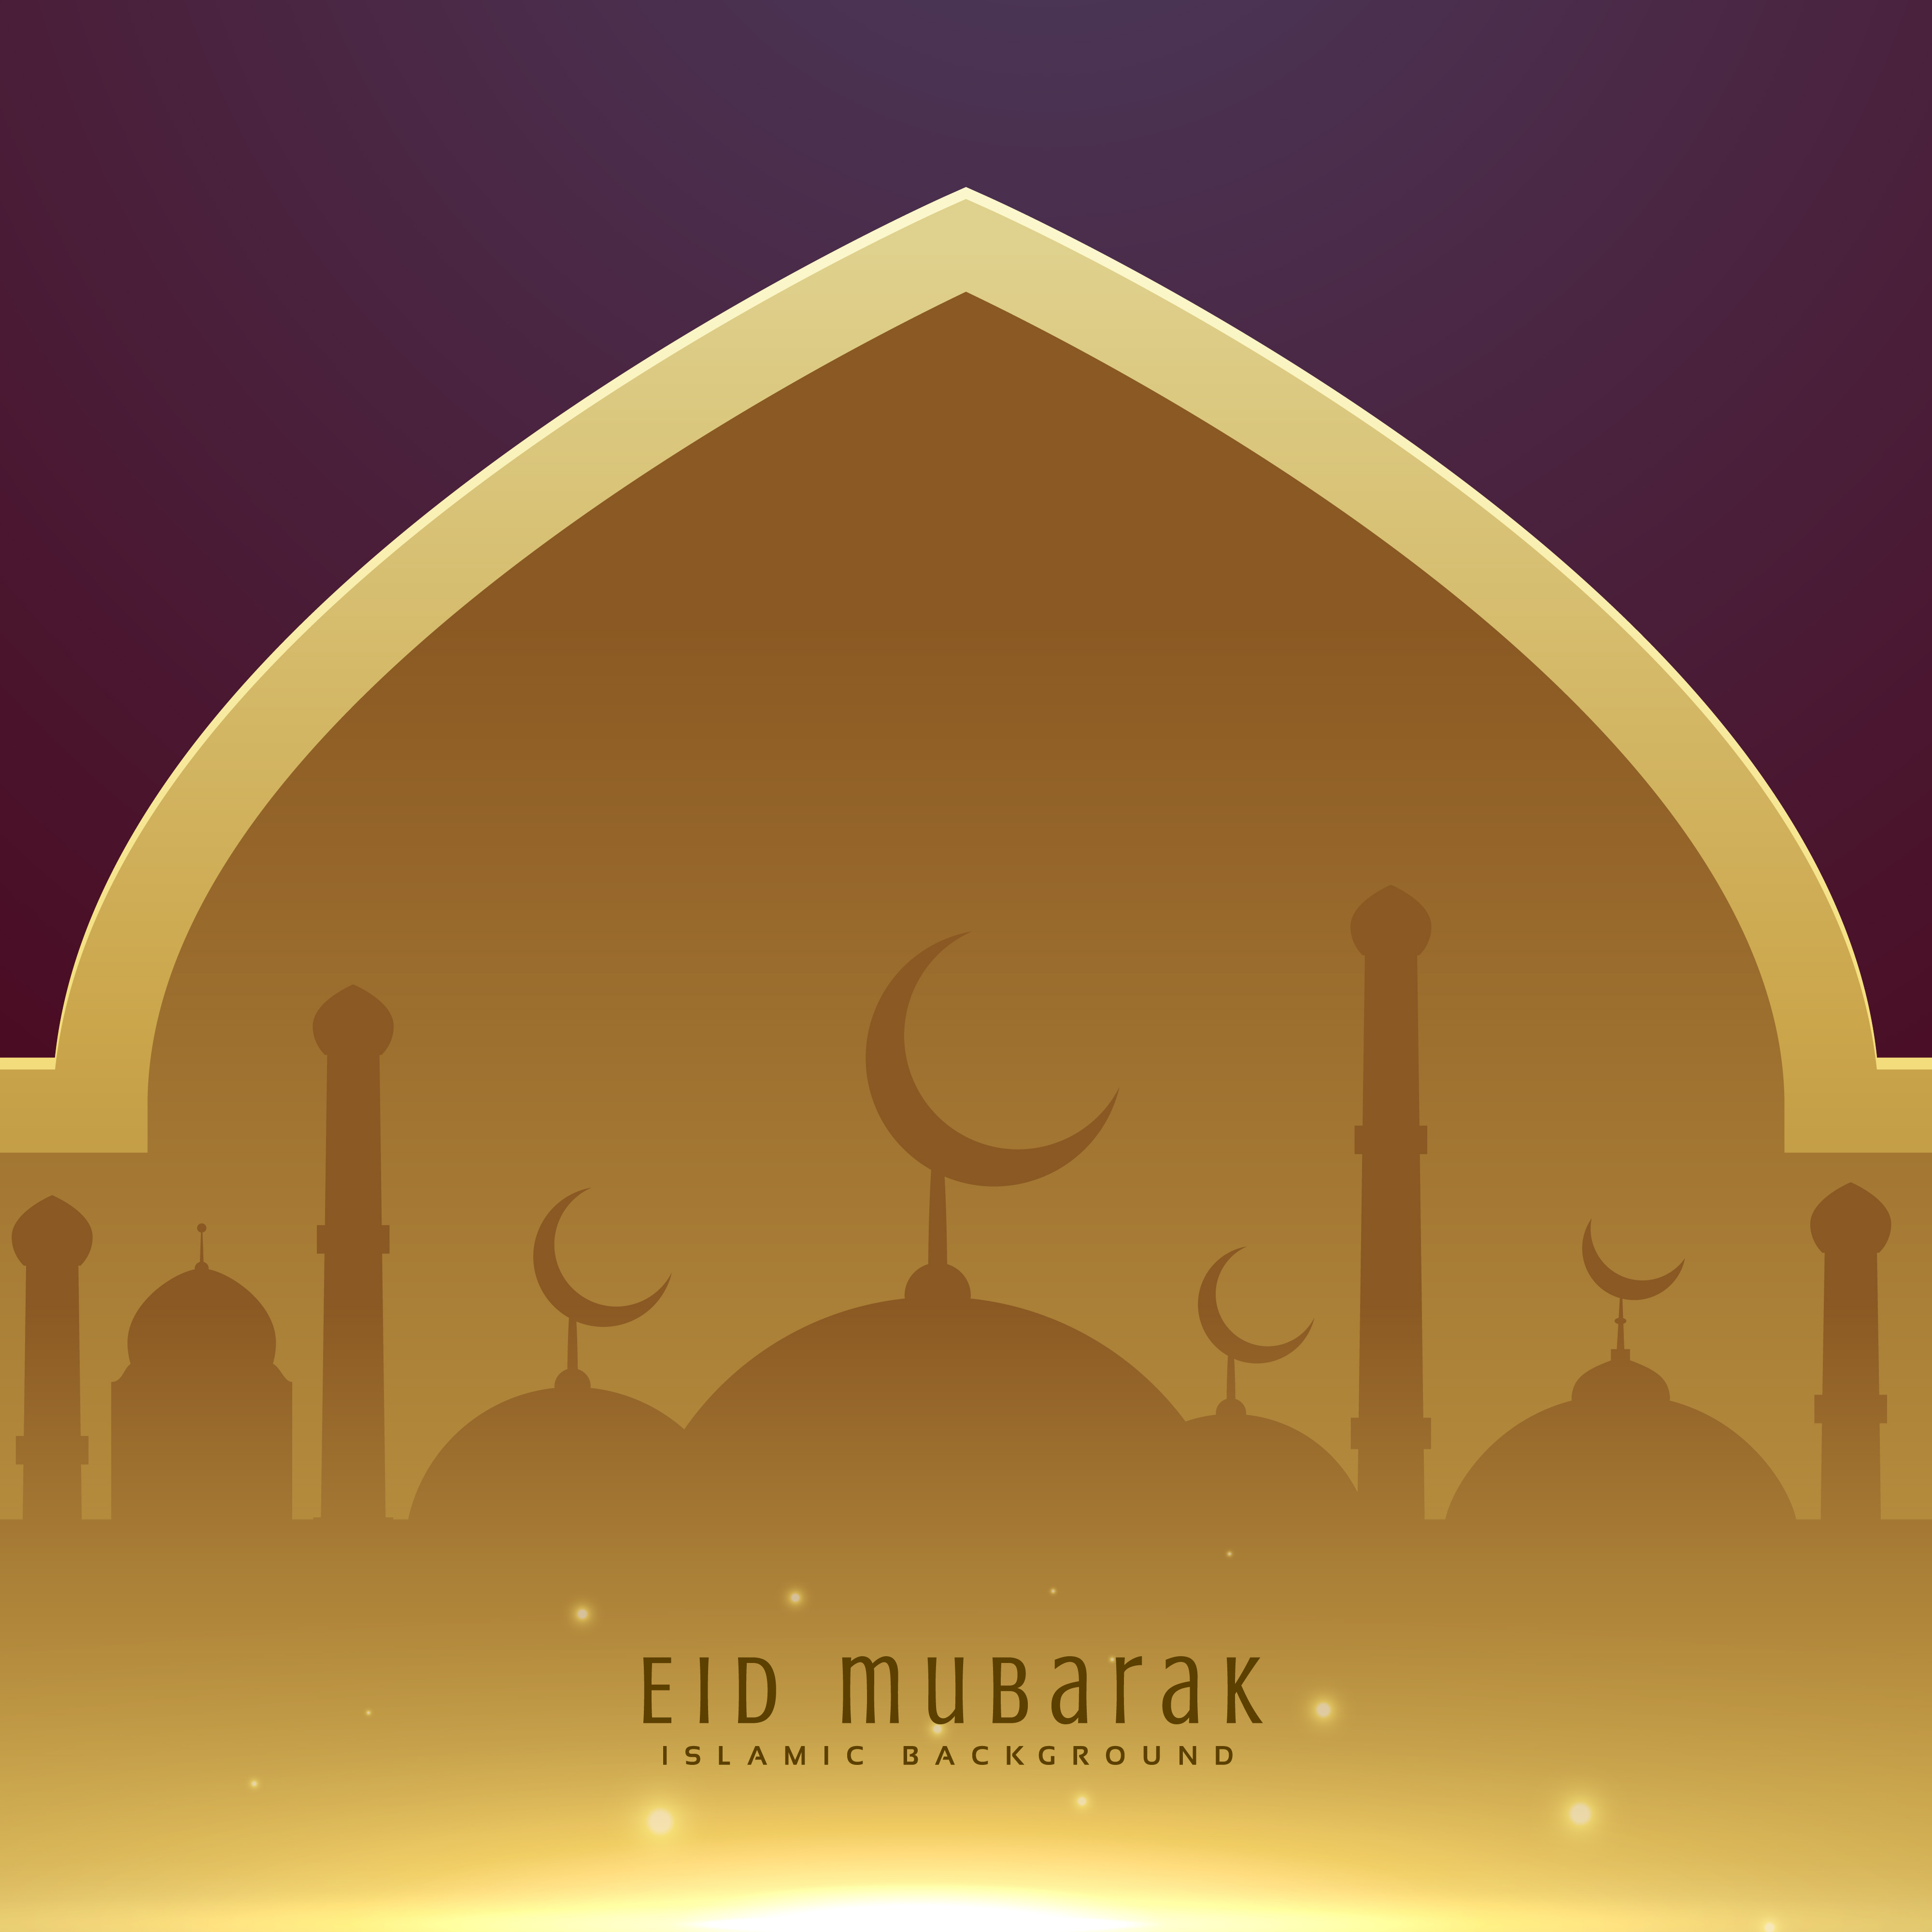 Beautiful Muslim Eid Festival Greeting Design Background Download